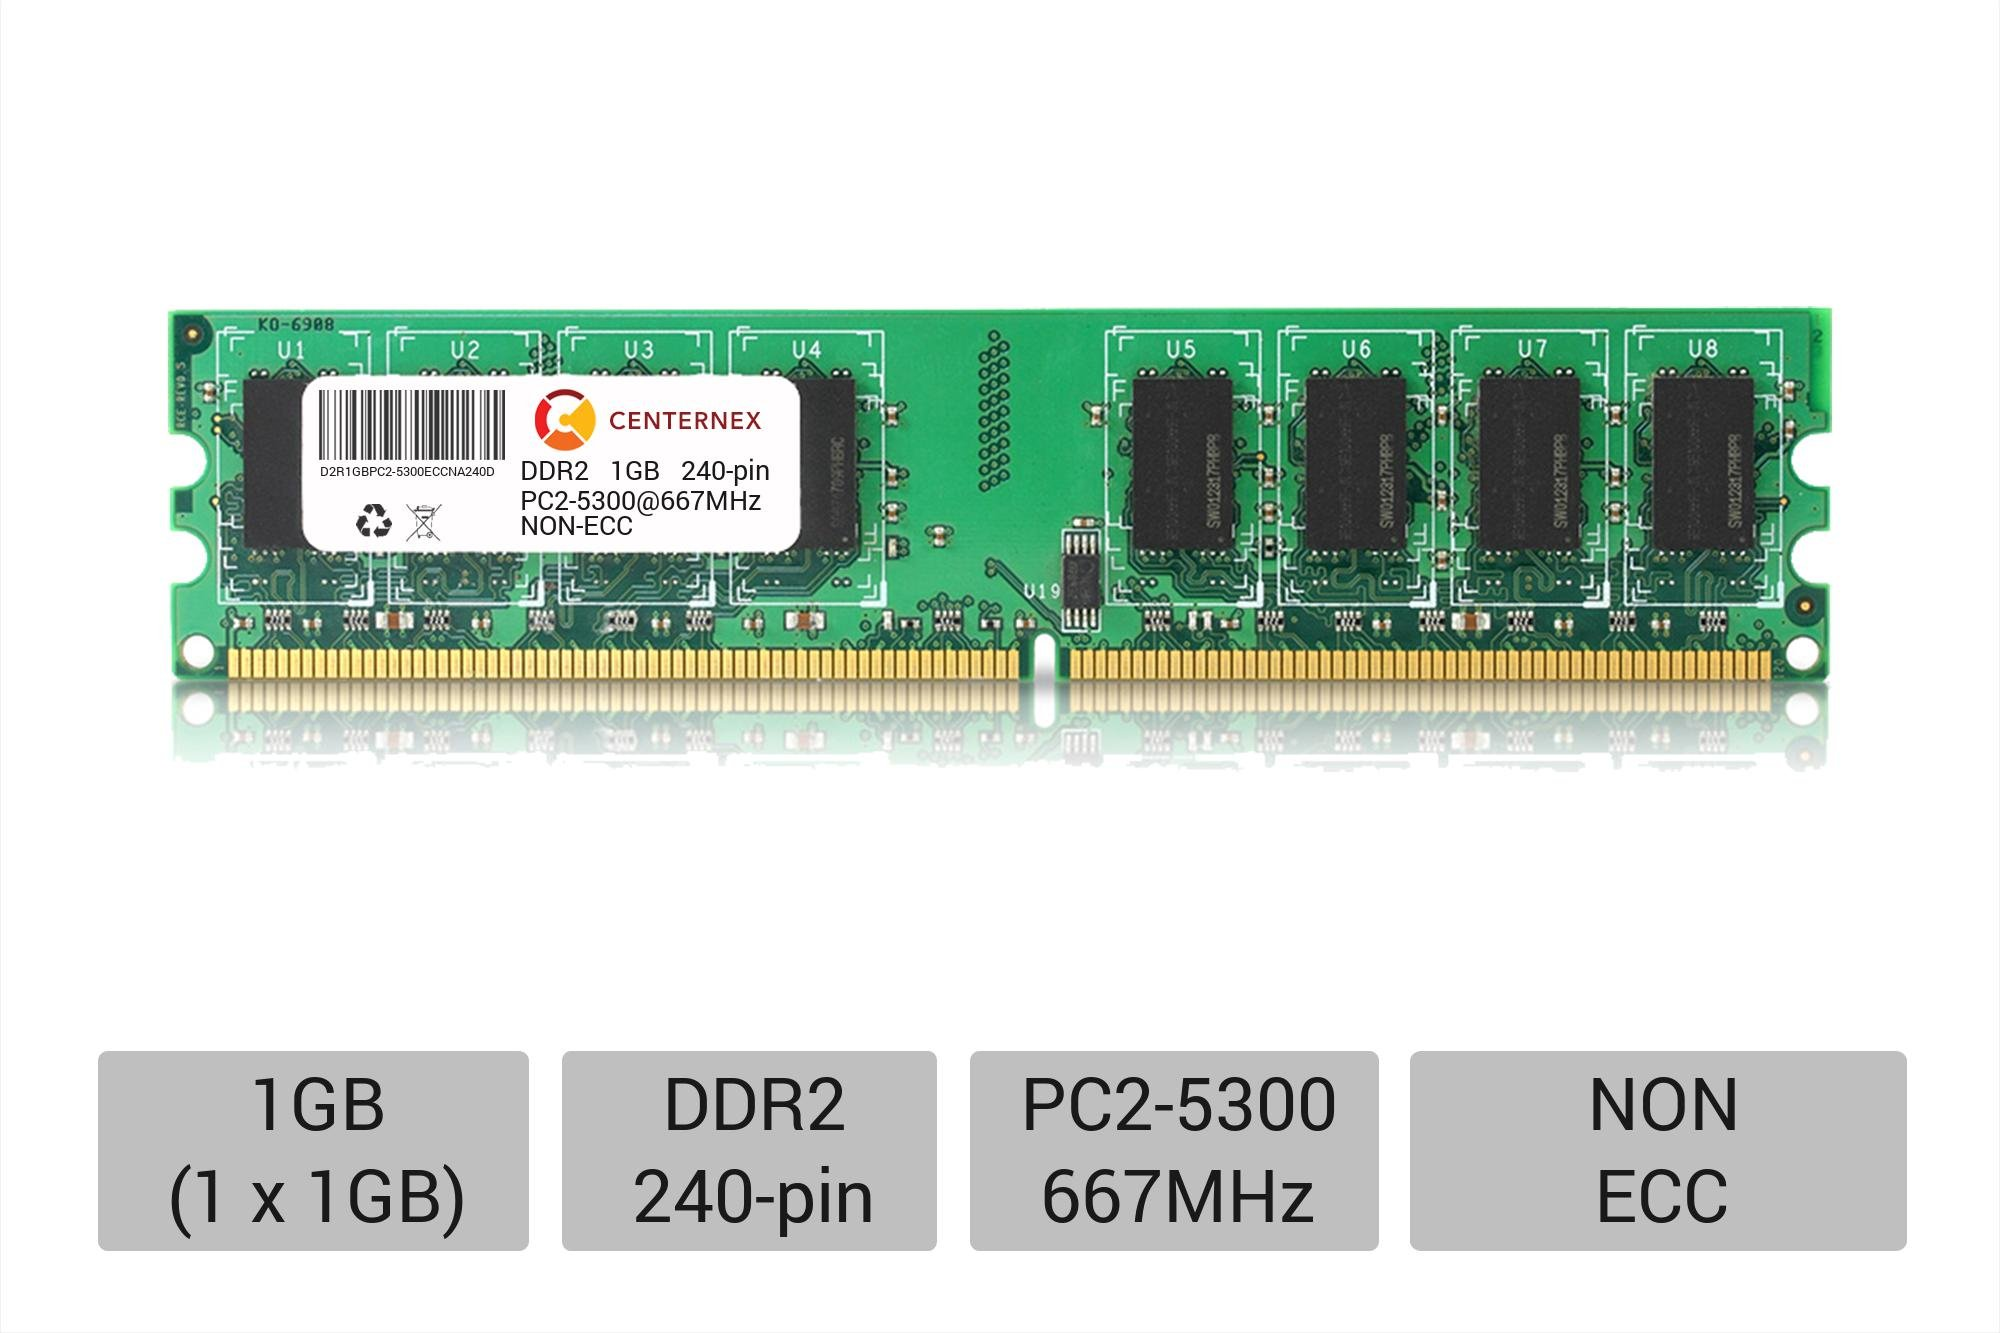 1GB DIMM Evesham Solar SX100 SX500 Ultimate GT VS VX VX500 XS Ram Memory by CENTERNEX